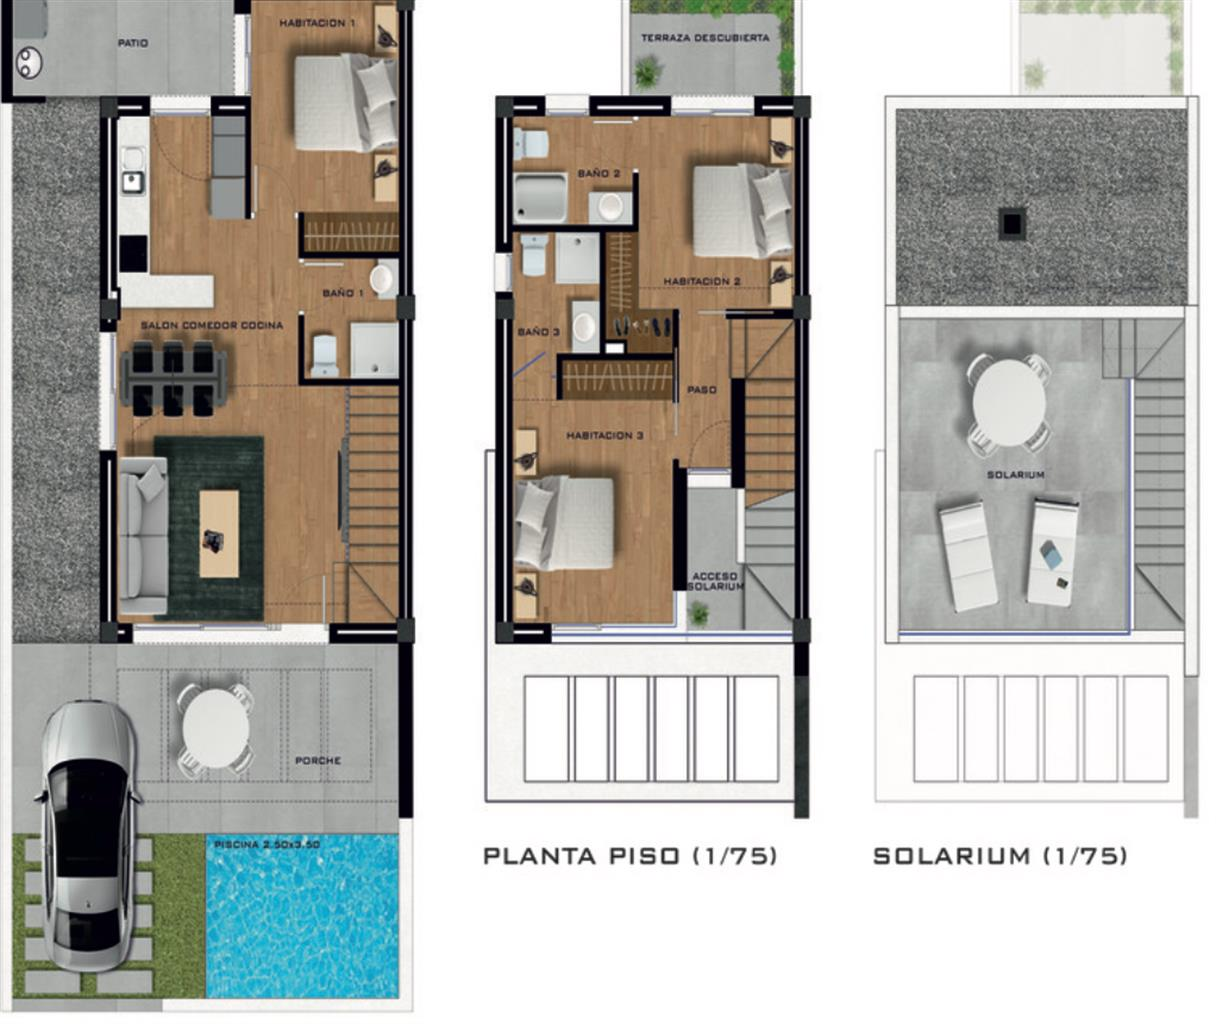 Maison - Villamartin - #4227904-11